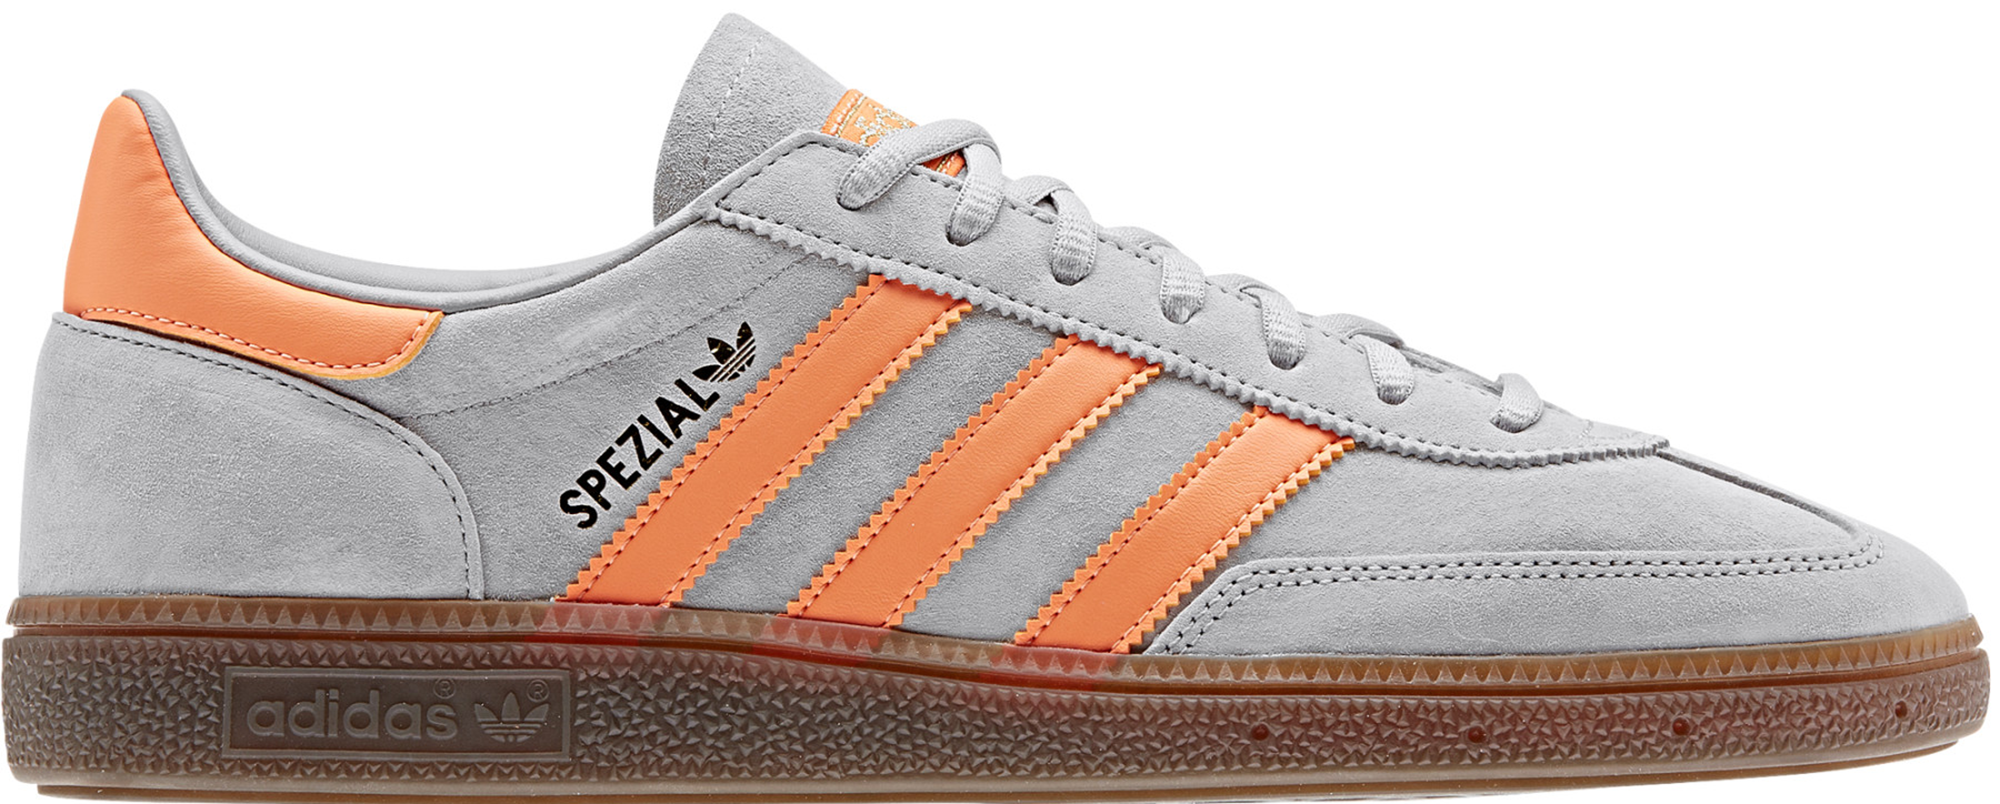 adidas Handball Spezial Grey Coral Gum